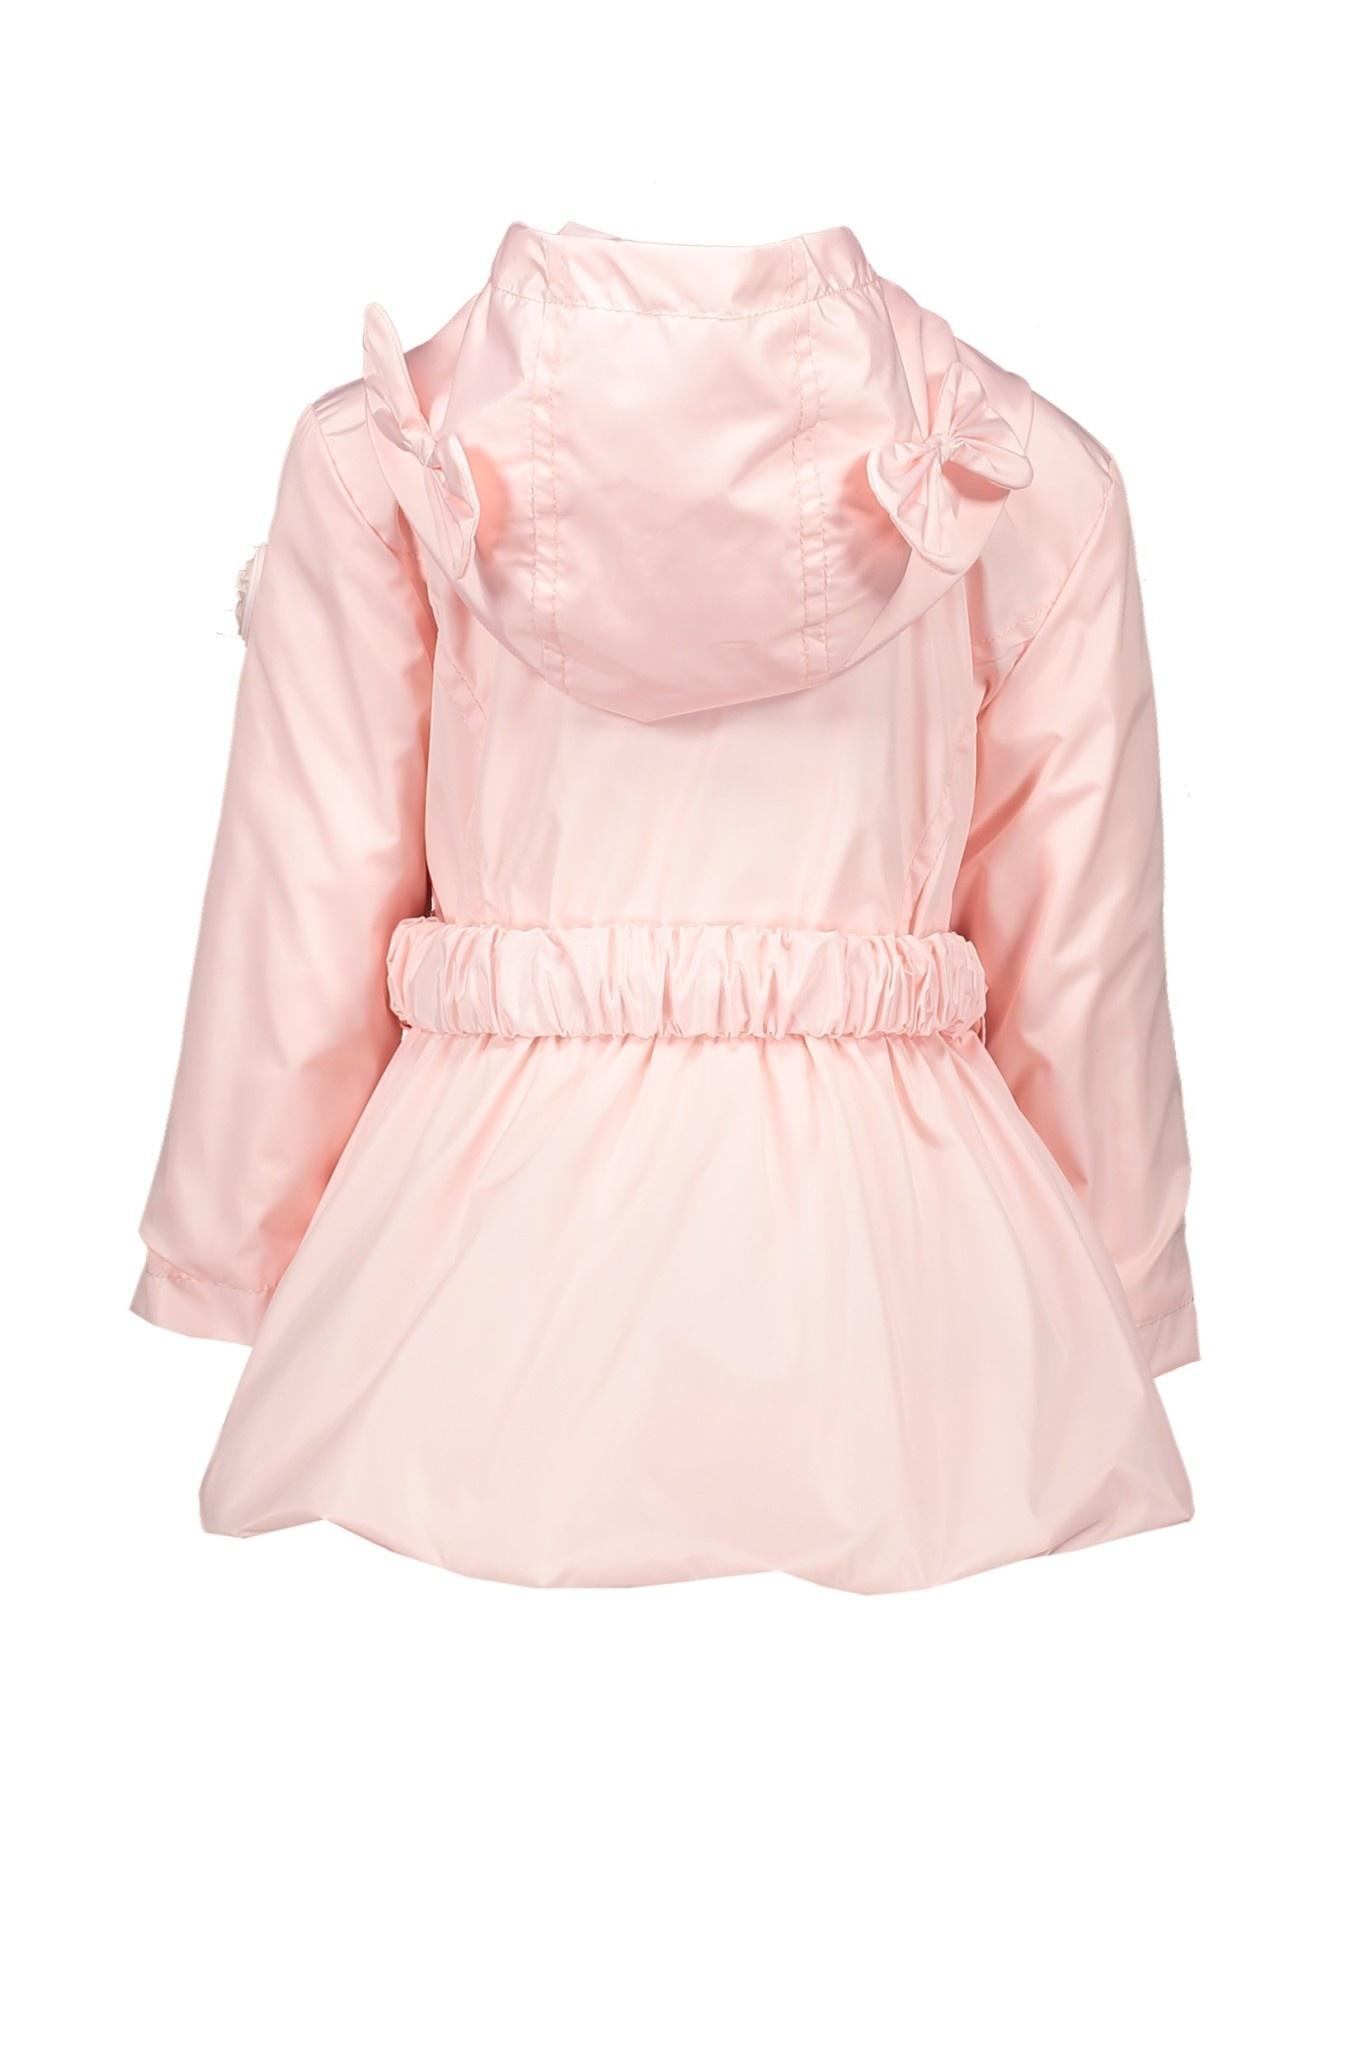 Lechic Le Chic Pink Bow Belt Coat 7209